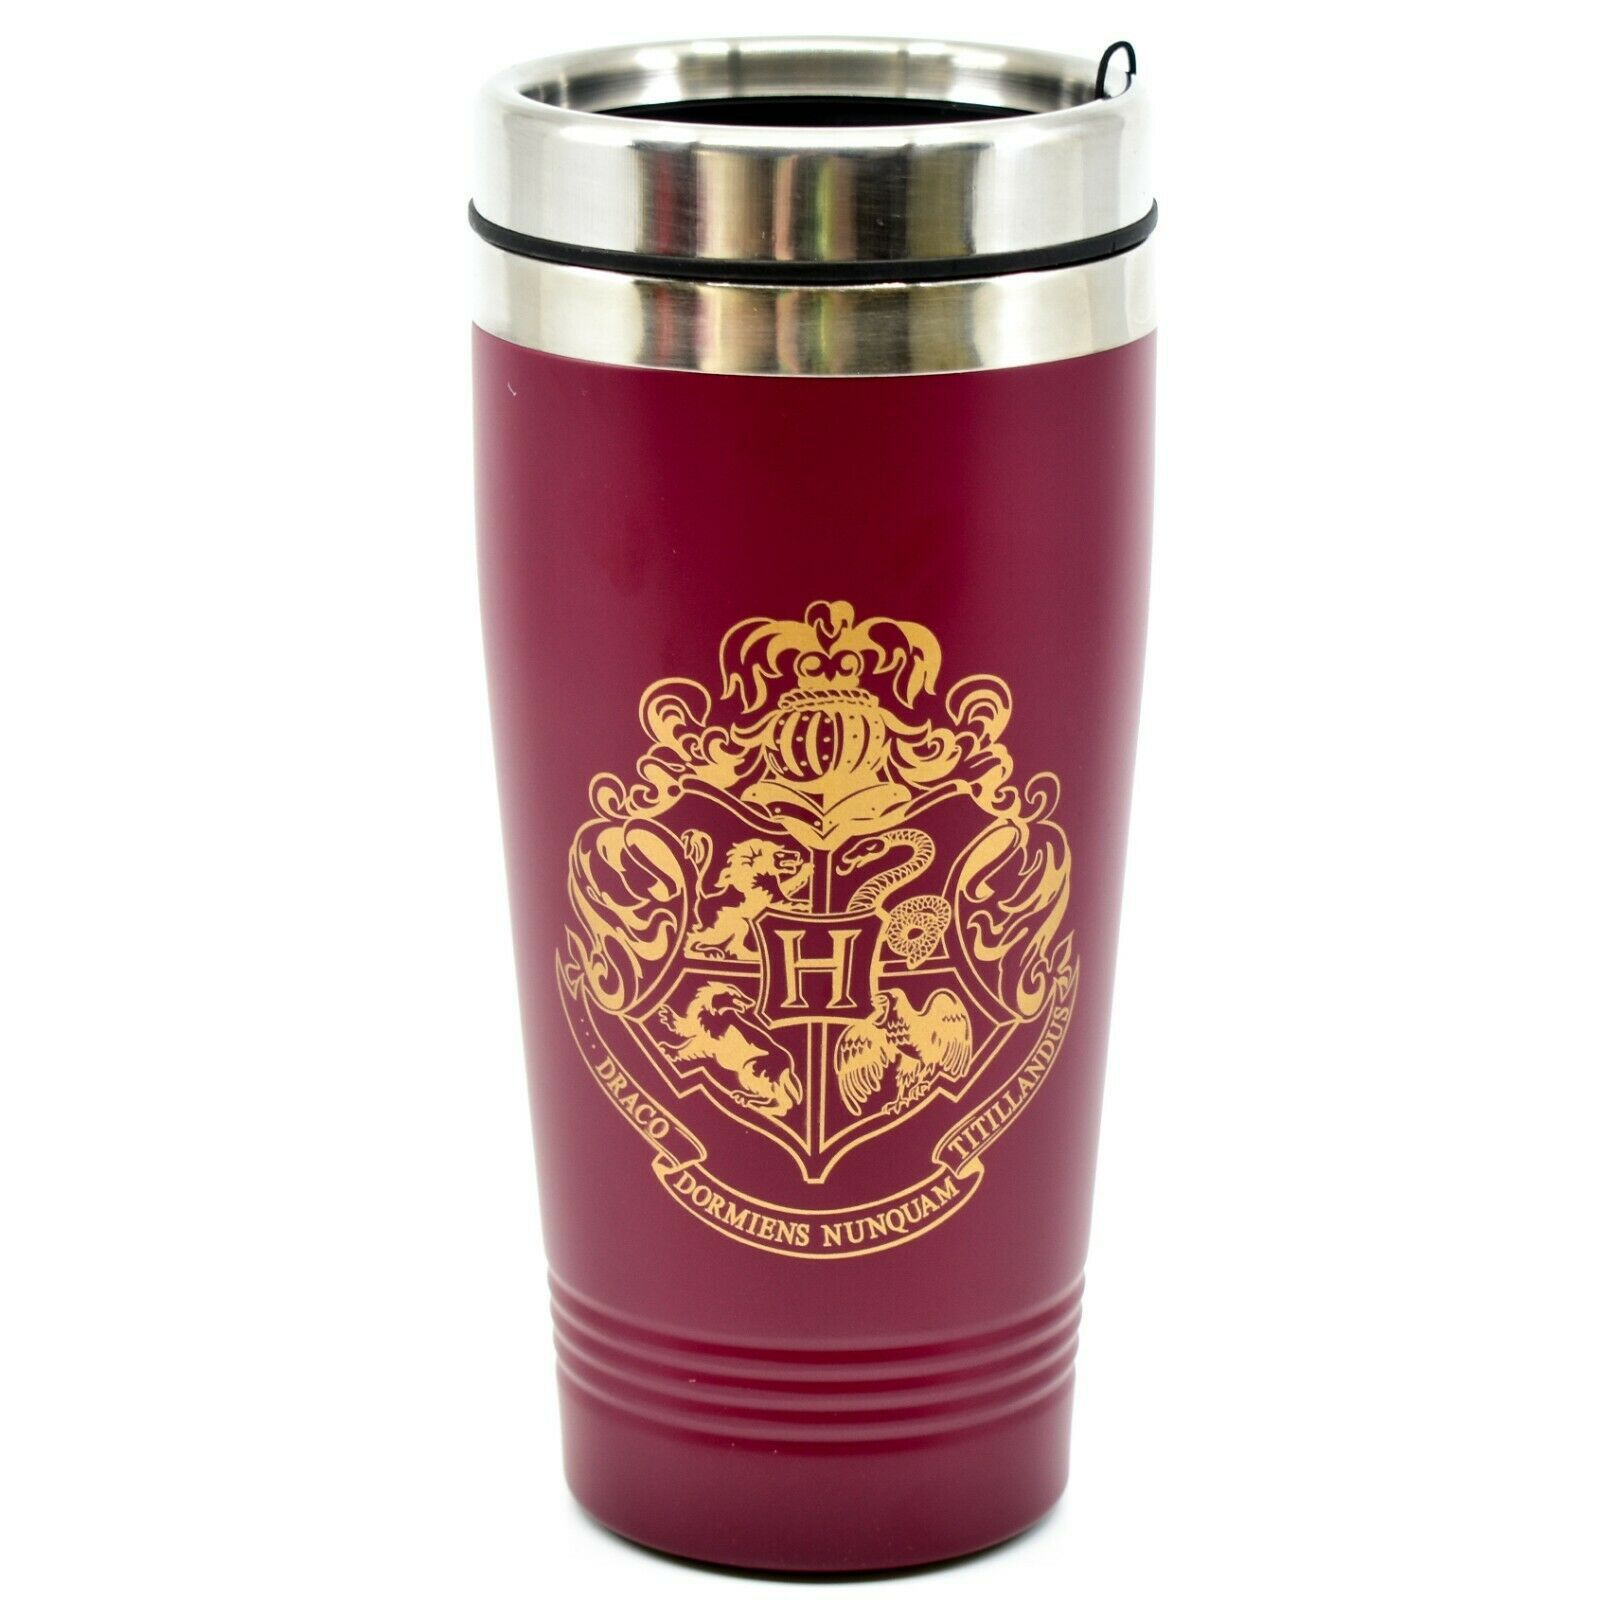 Harry Potter Hogwarts Shield Crest Maroon and Gold 15 oz Travel Coffee Mug